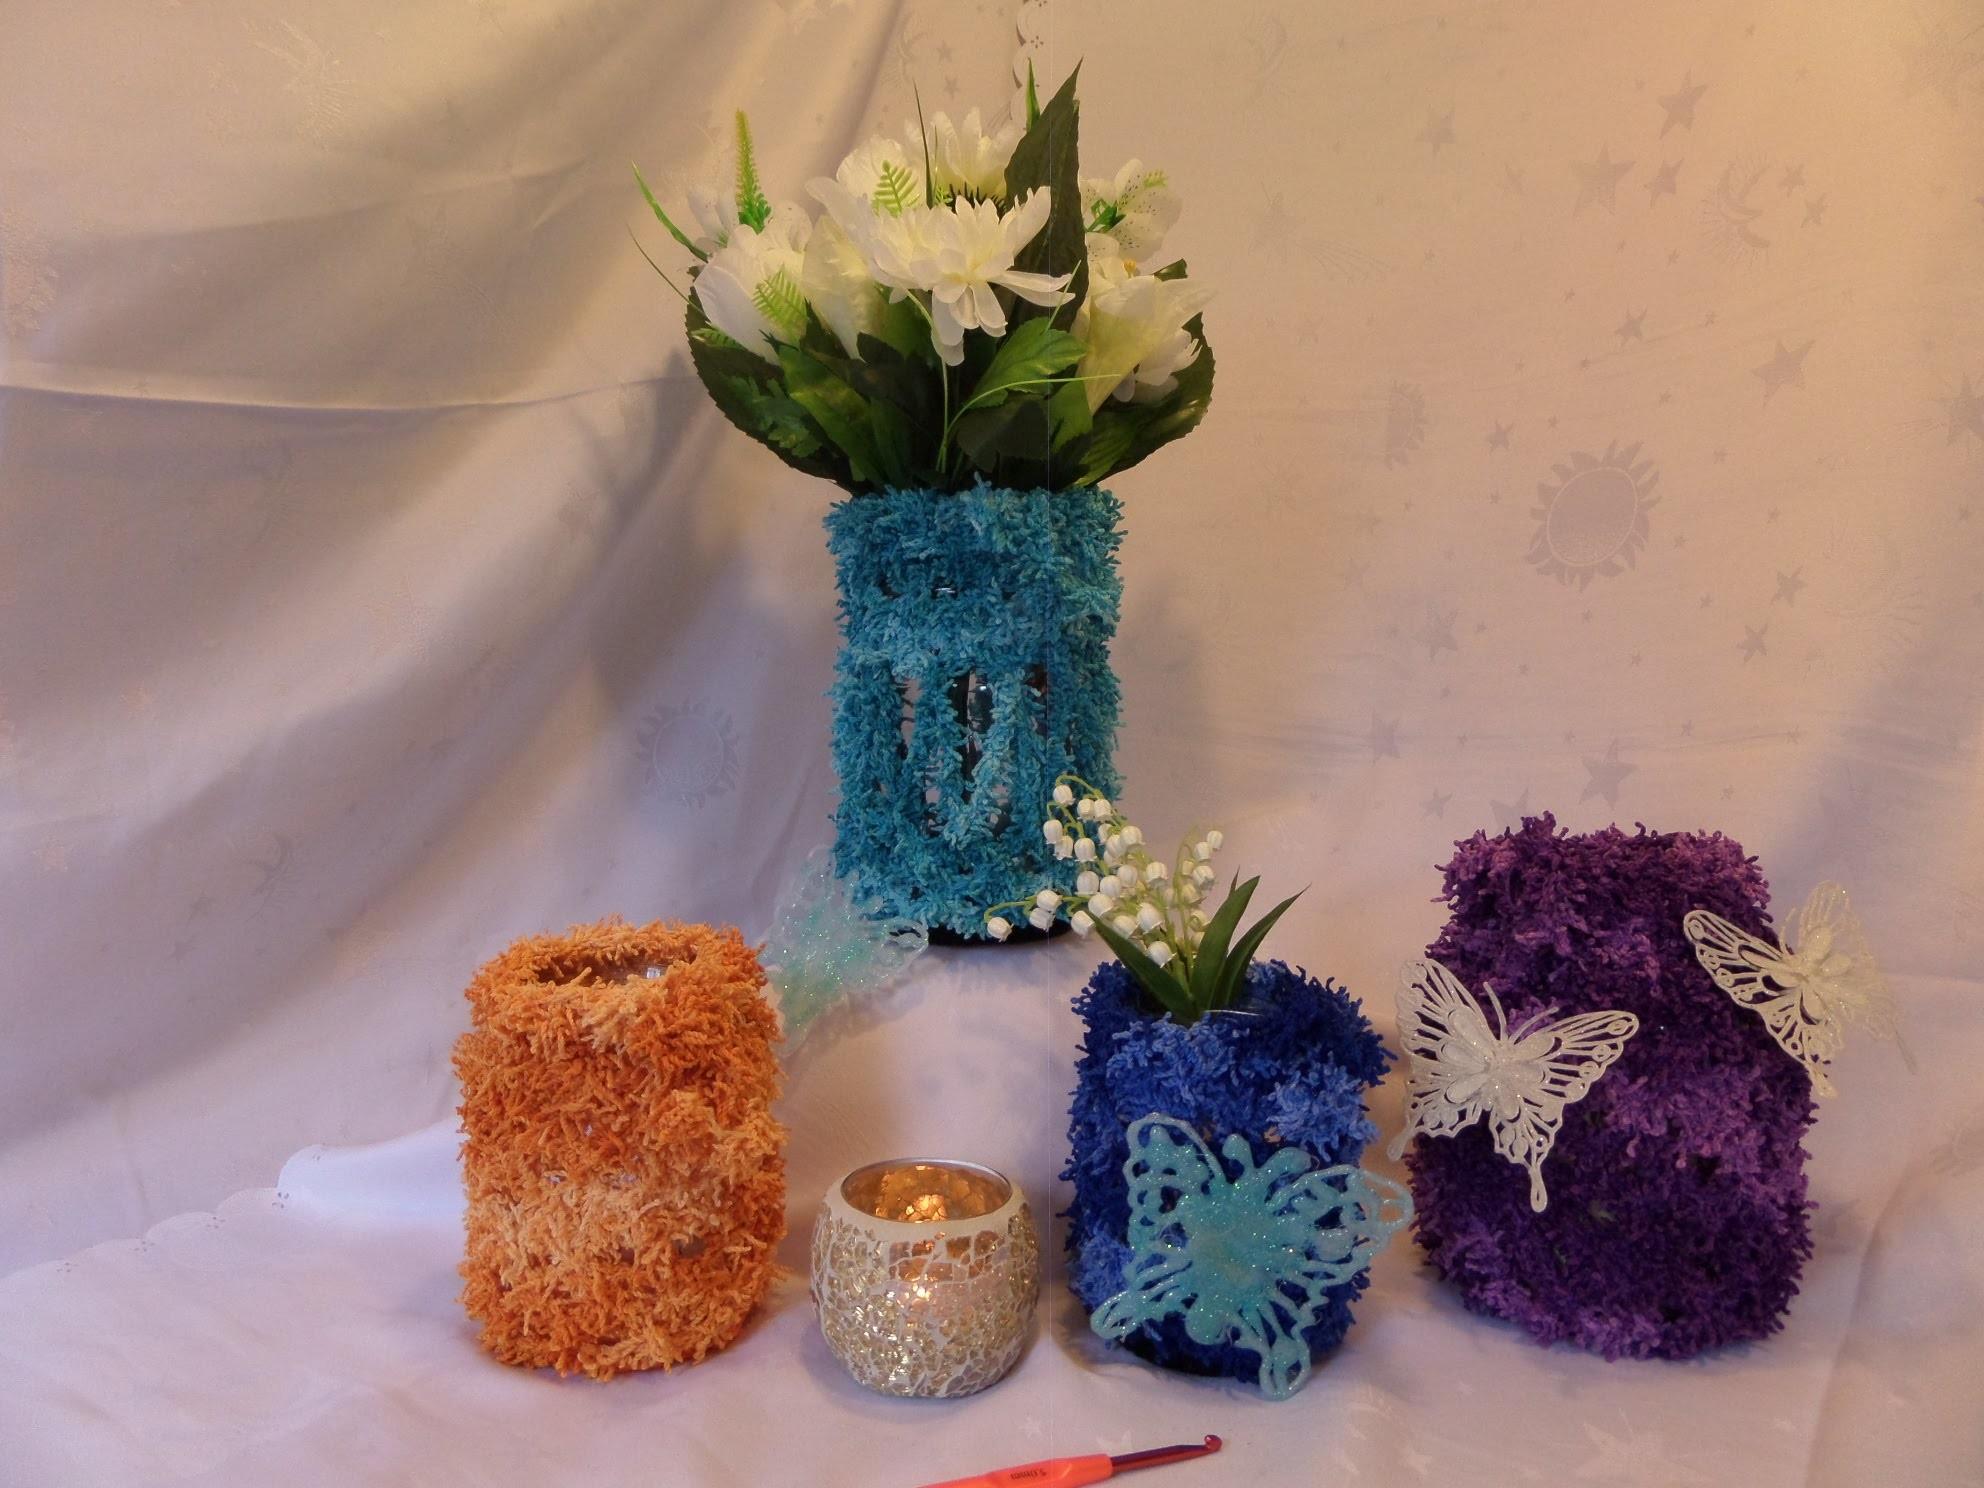 Diy keka bunte deko gl ser vasen windlichter h keln - Geschenk dekorieren ...